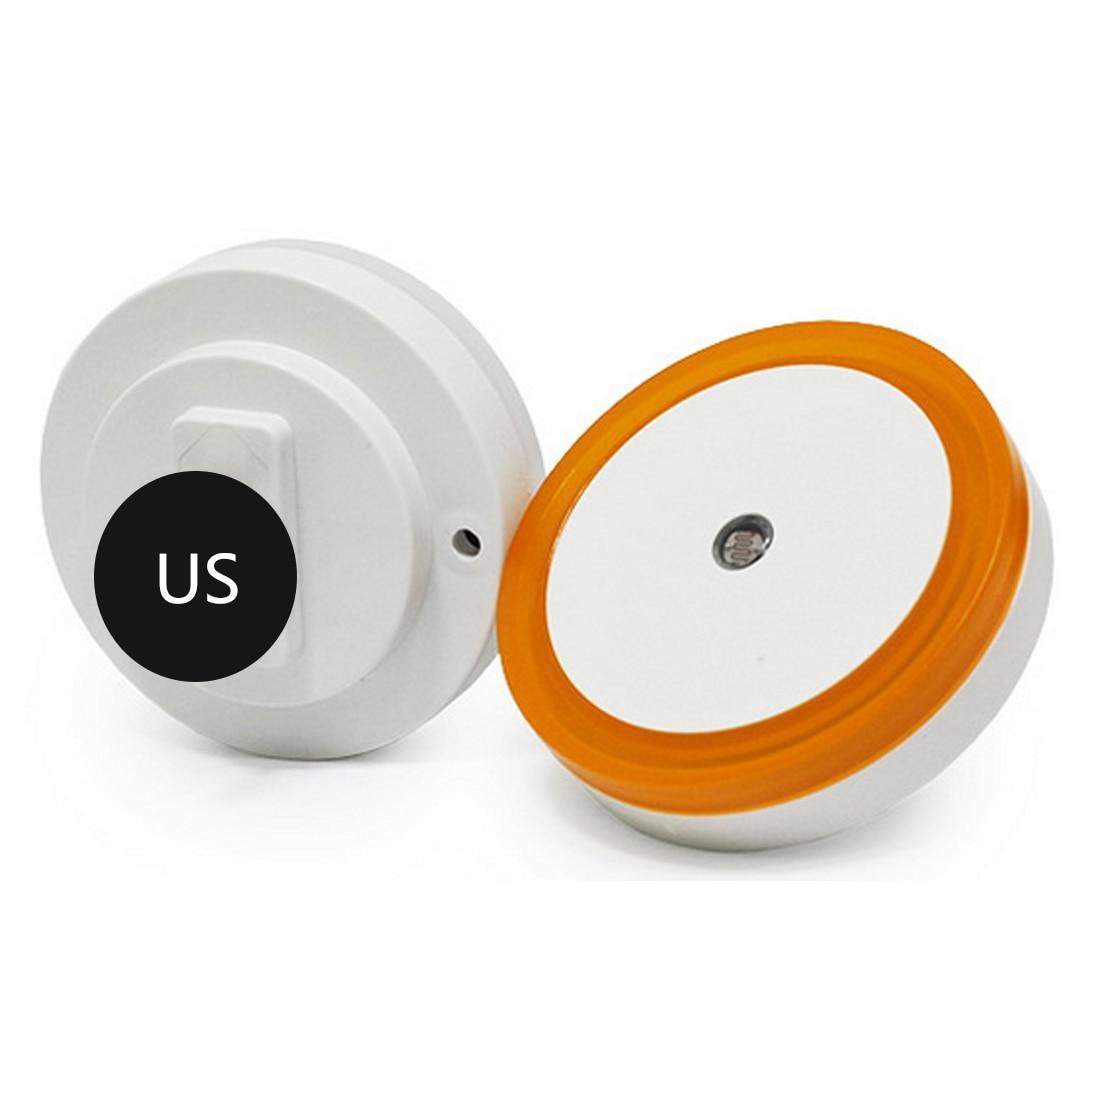 1 St Auto Led Licht Praktische Inductie Sensor Controle Slaapkamer Night Lights Bed Lamp Ronde Vorm 110-220 V 4 Kleuren Us Plug